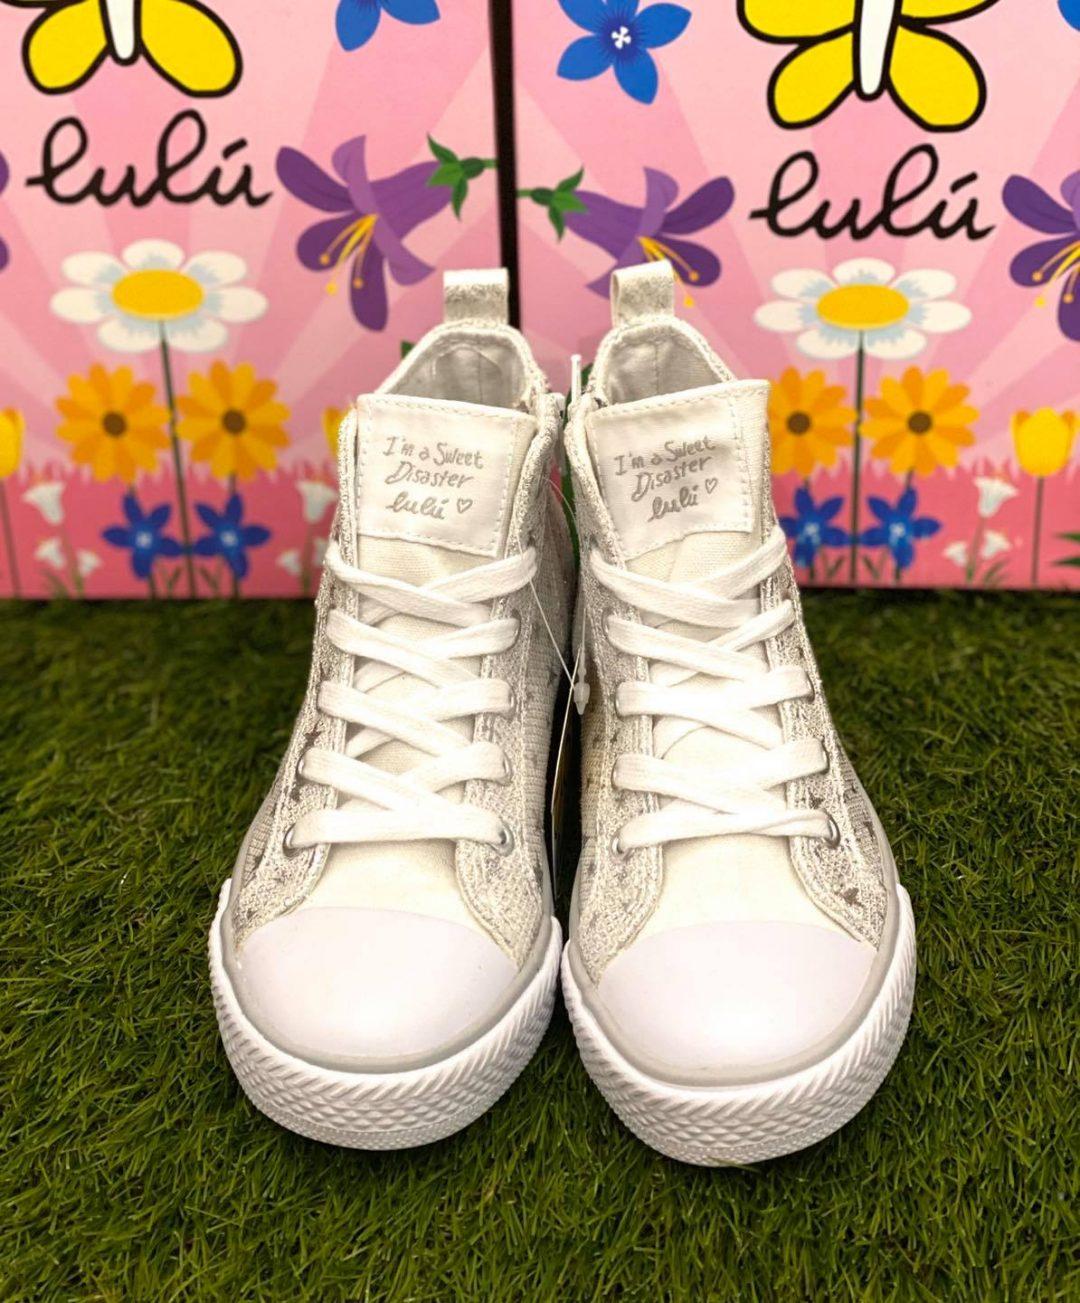 Lulu bambina bianco